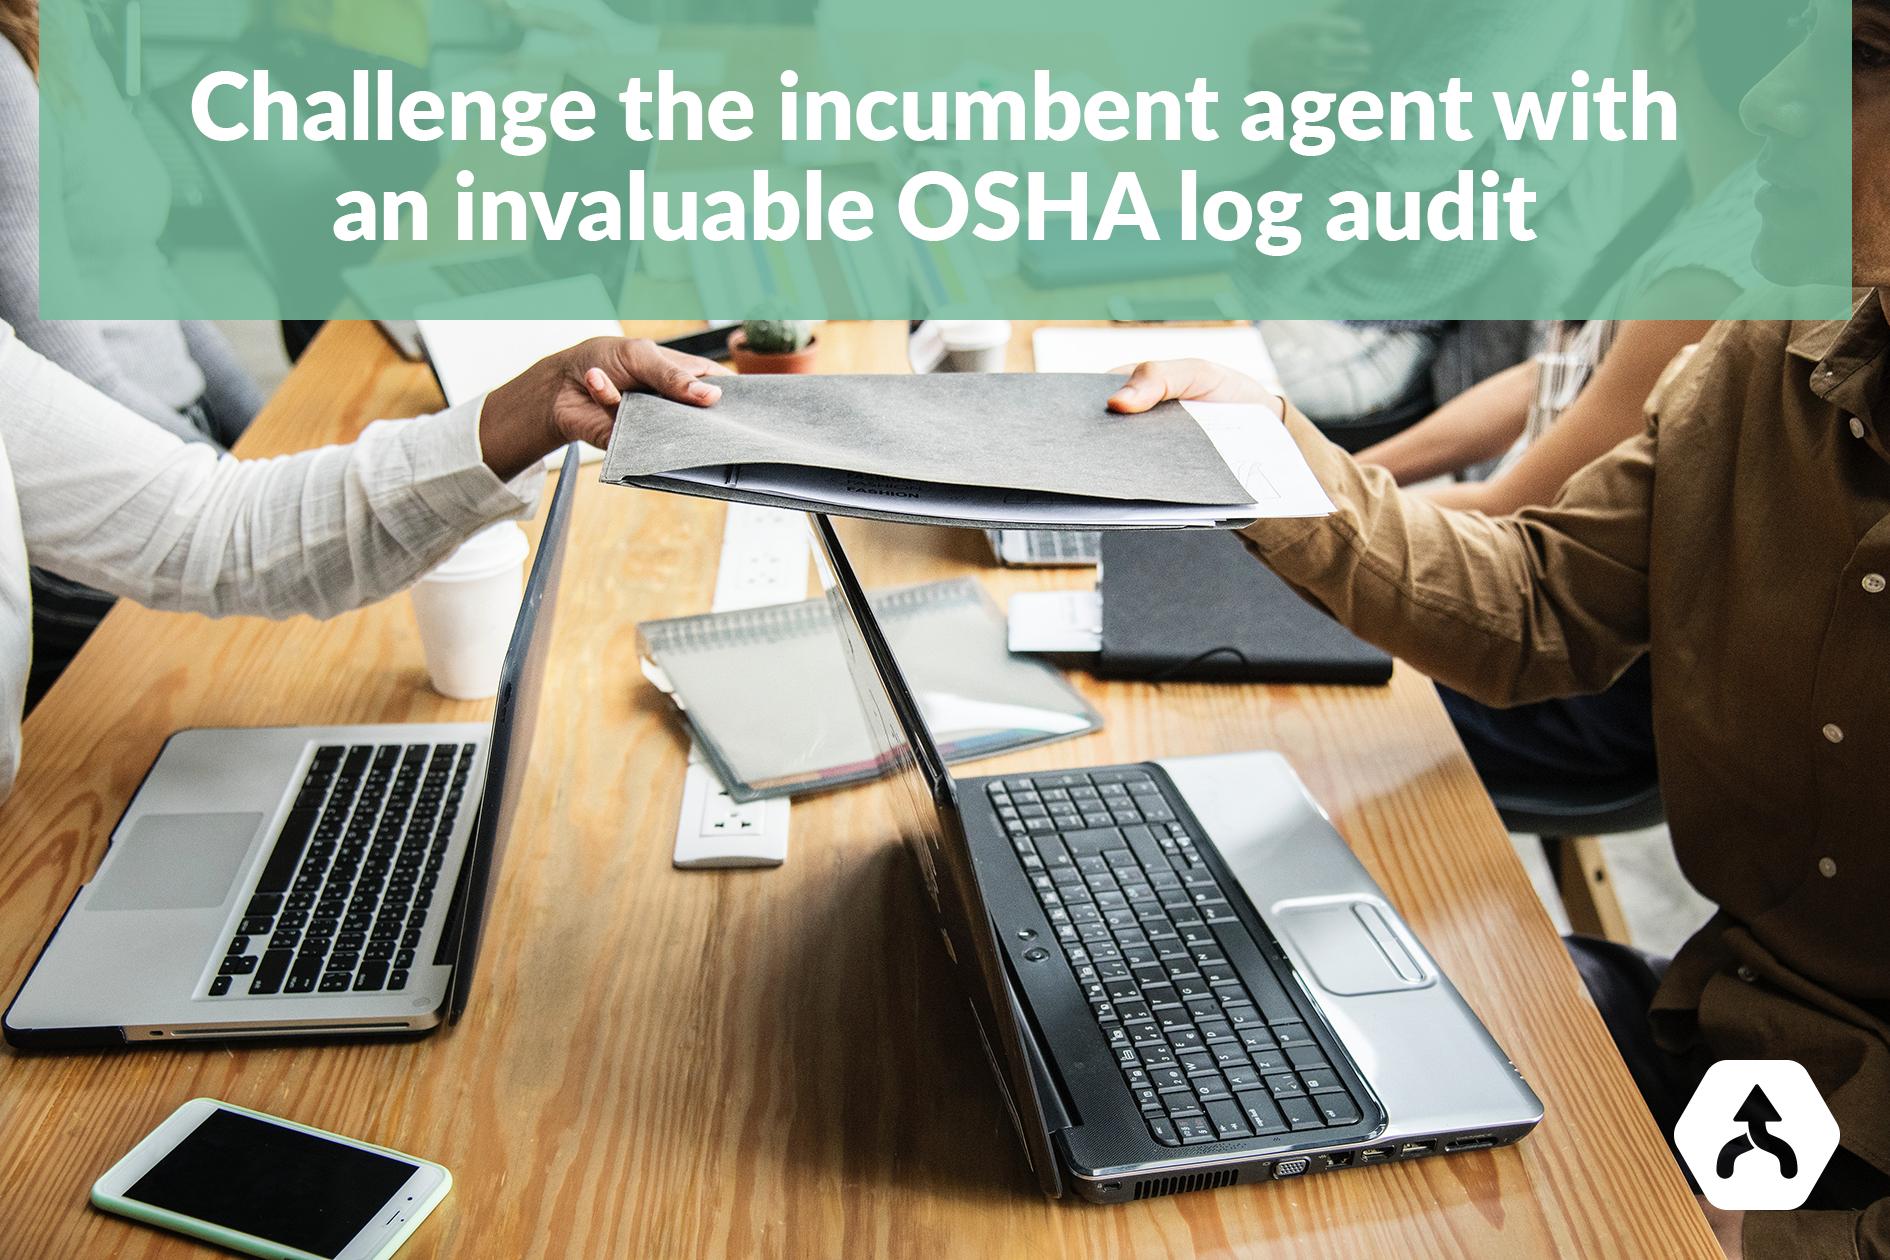 Challenge the imcumbent agent with an invaluable OSHA log audit.